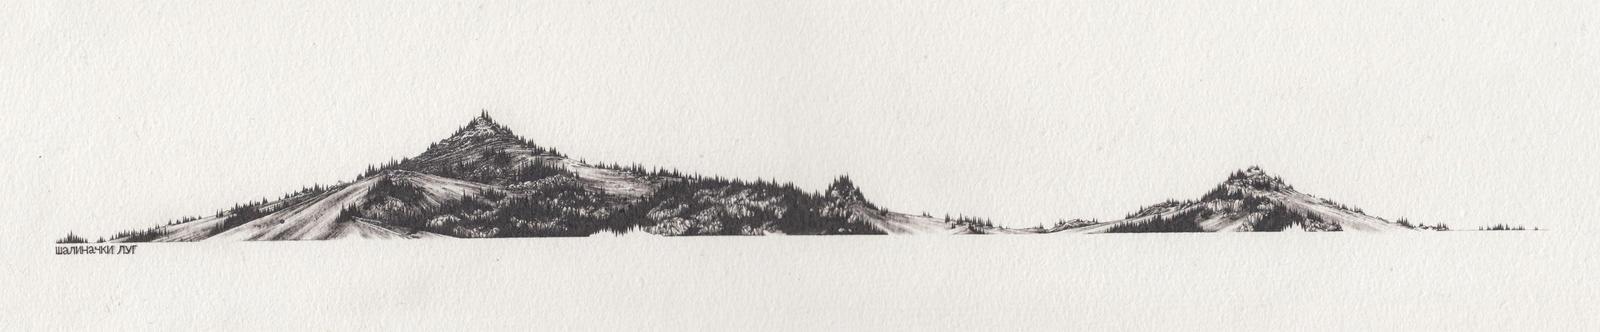 salinac grove